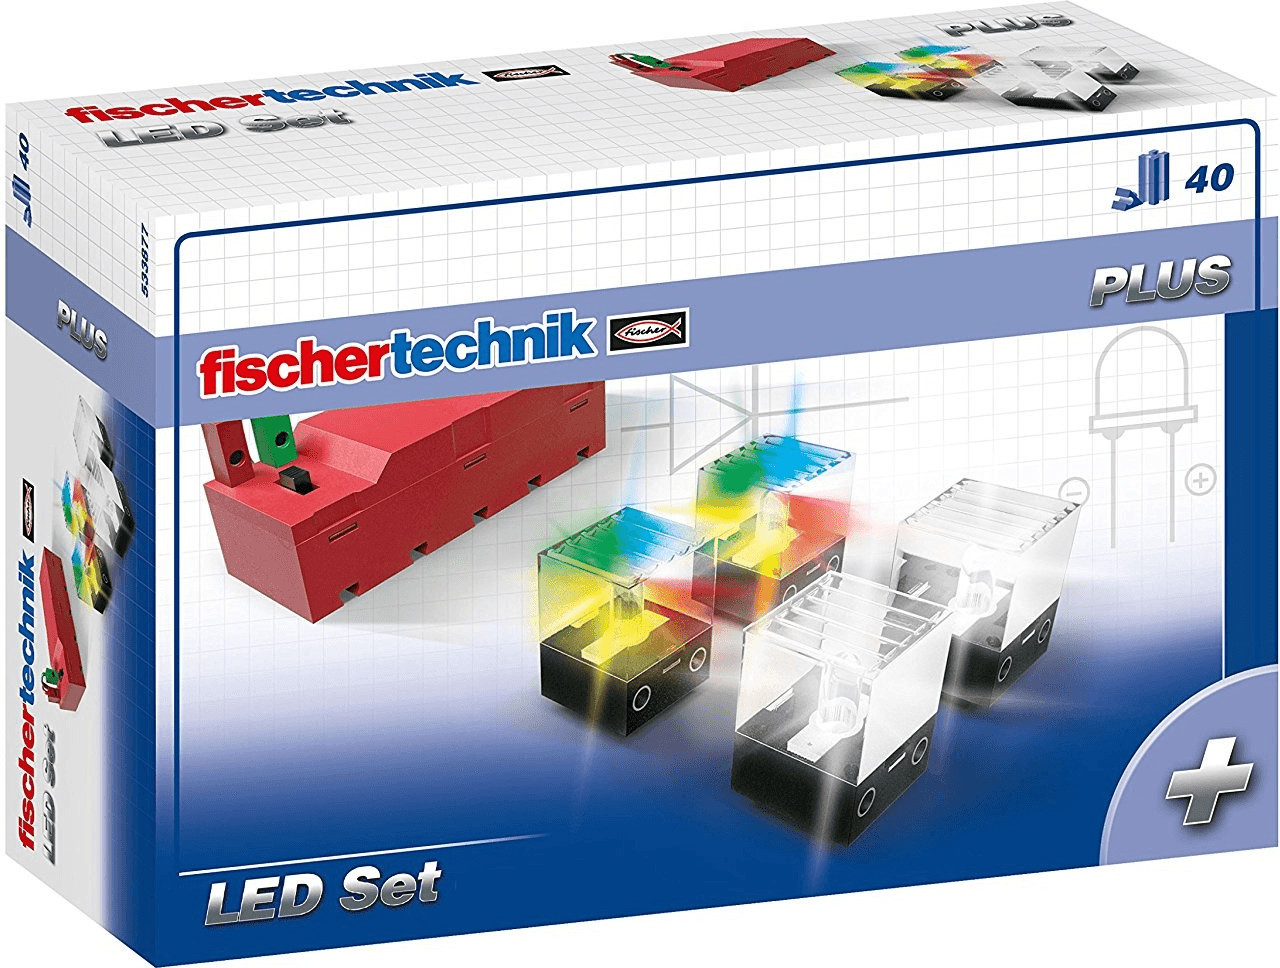 Fischertechnik LED Set